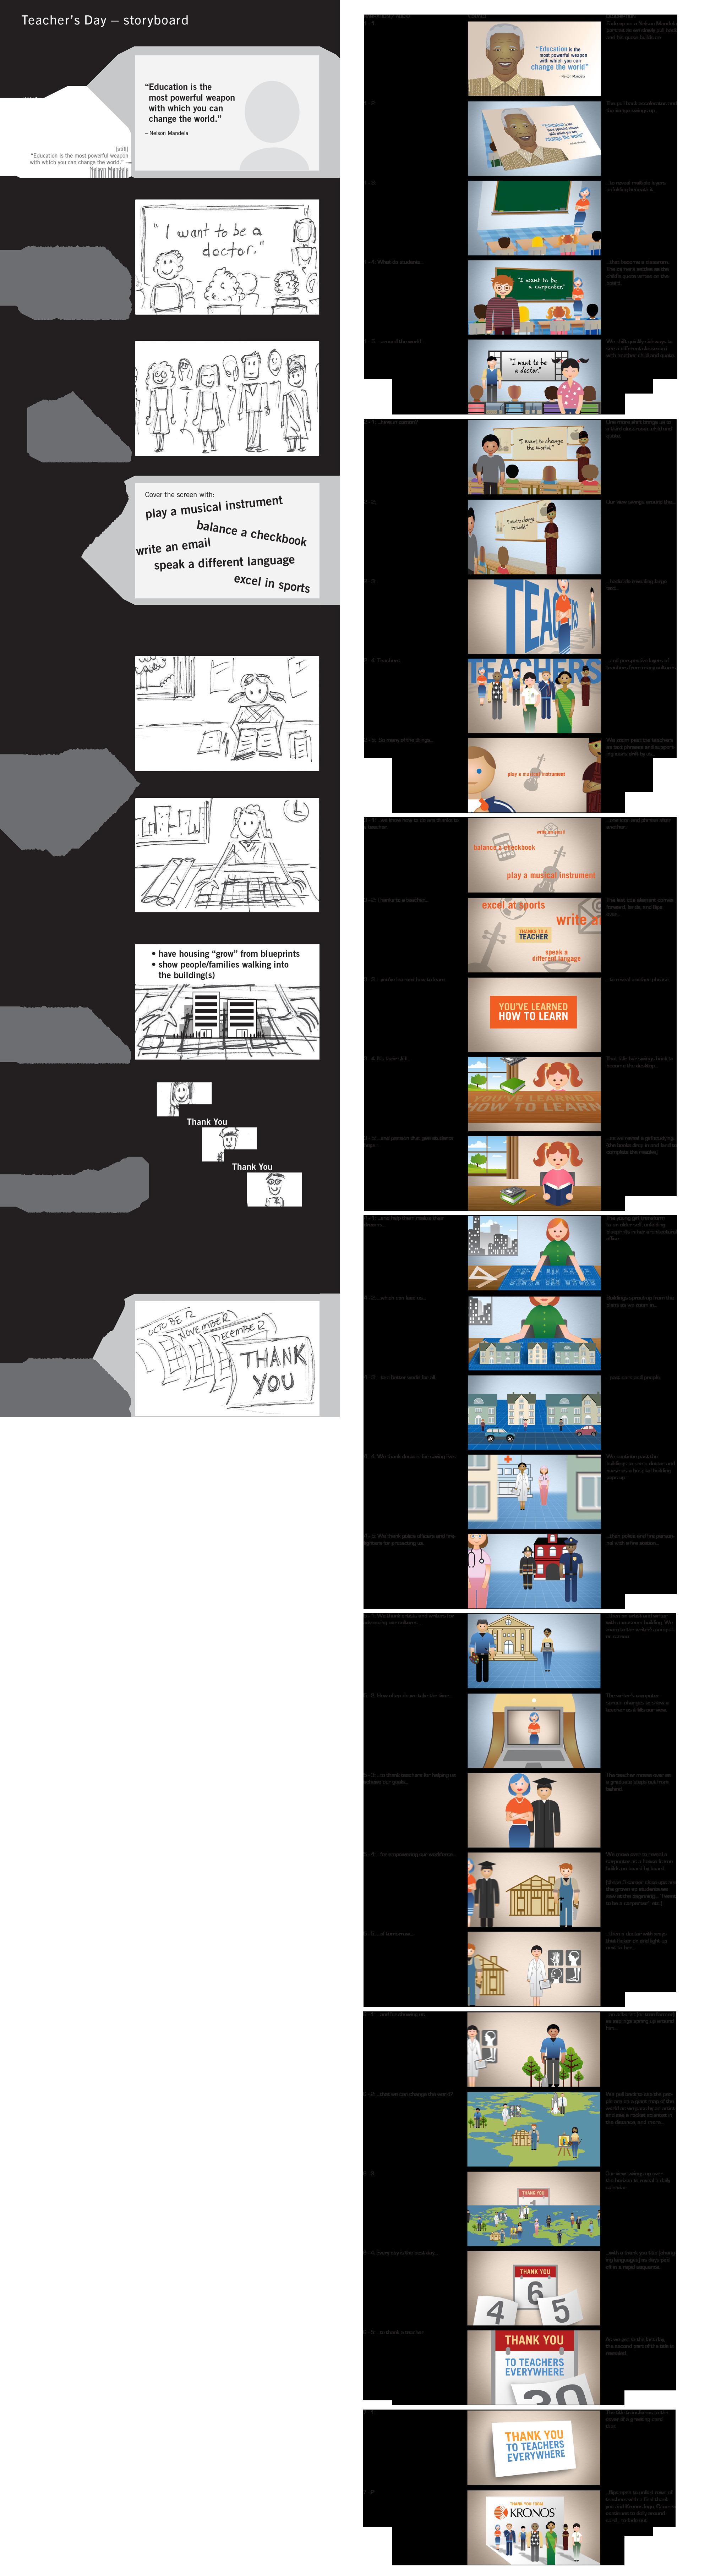 Teacher Appreciation storyboard